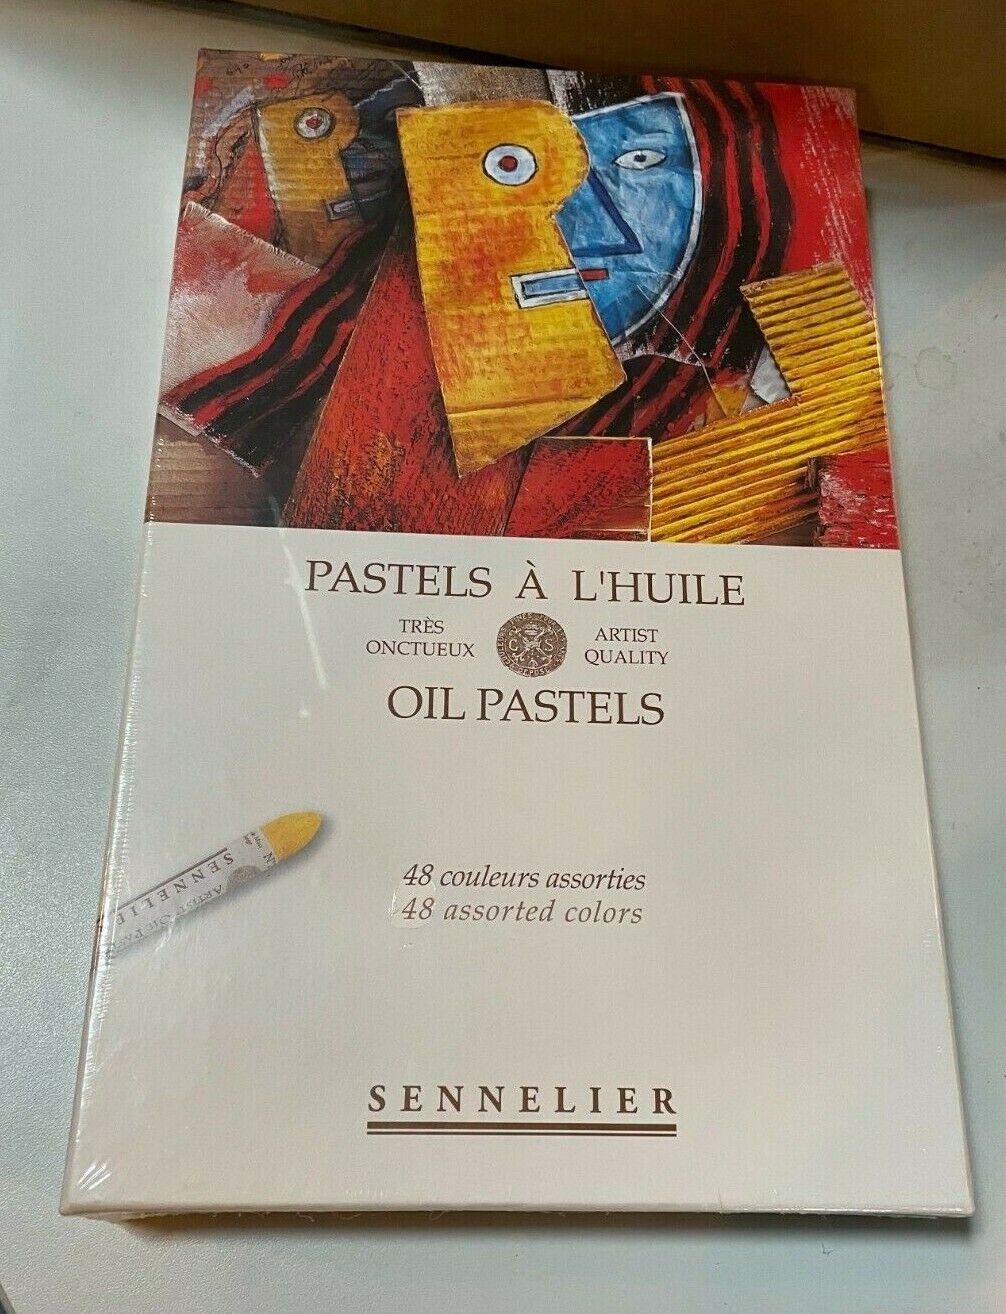 Sennelier Oil Pastels Cardboard Box Set of 48 Standard - Assorted Colors